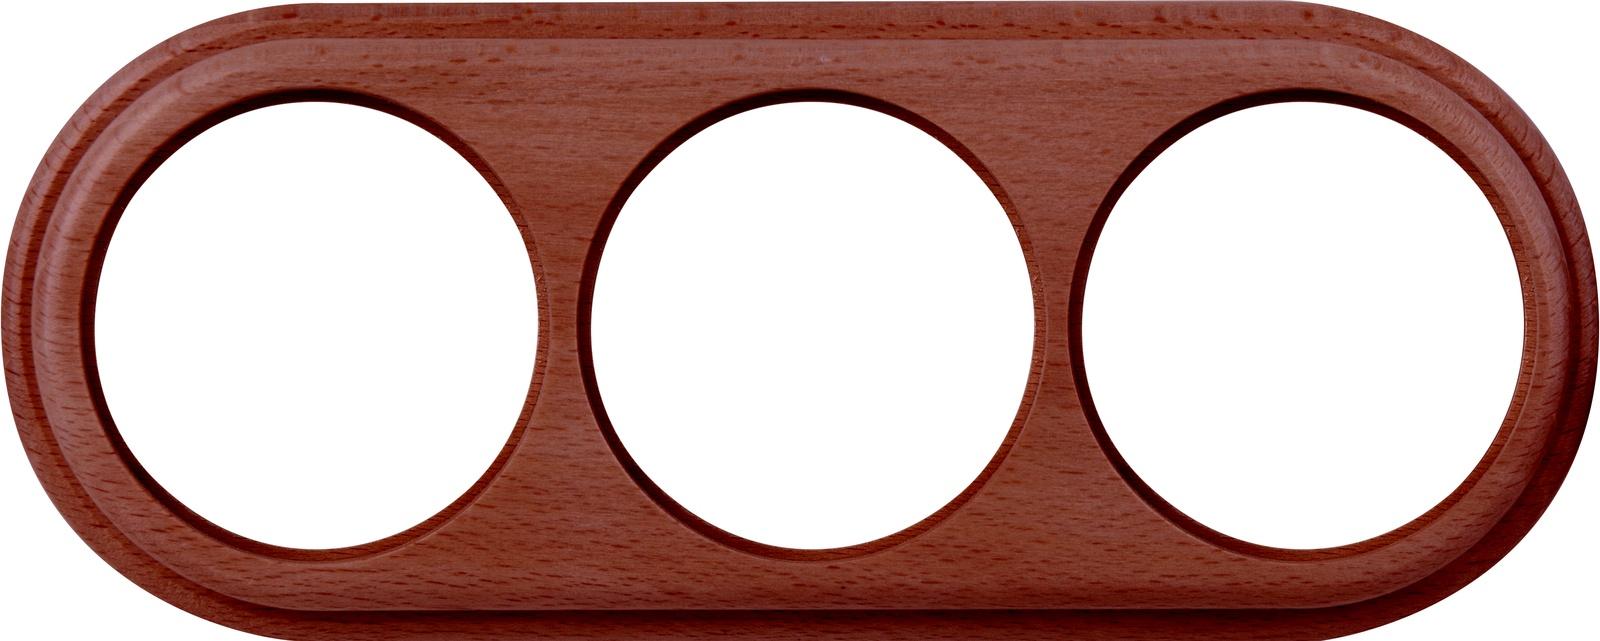 WL15-frame-03  Рамка на 3 поста итальянский орех